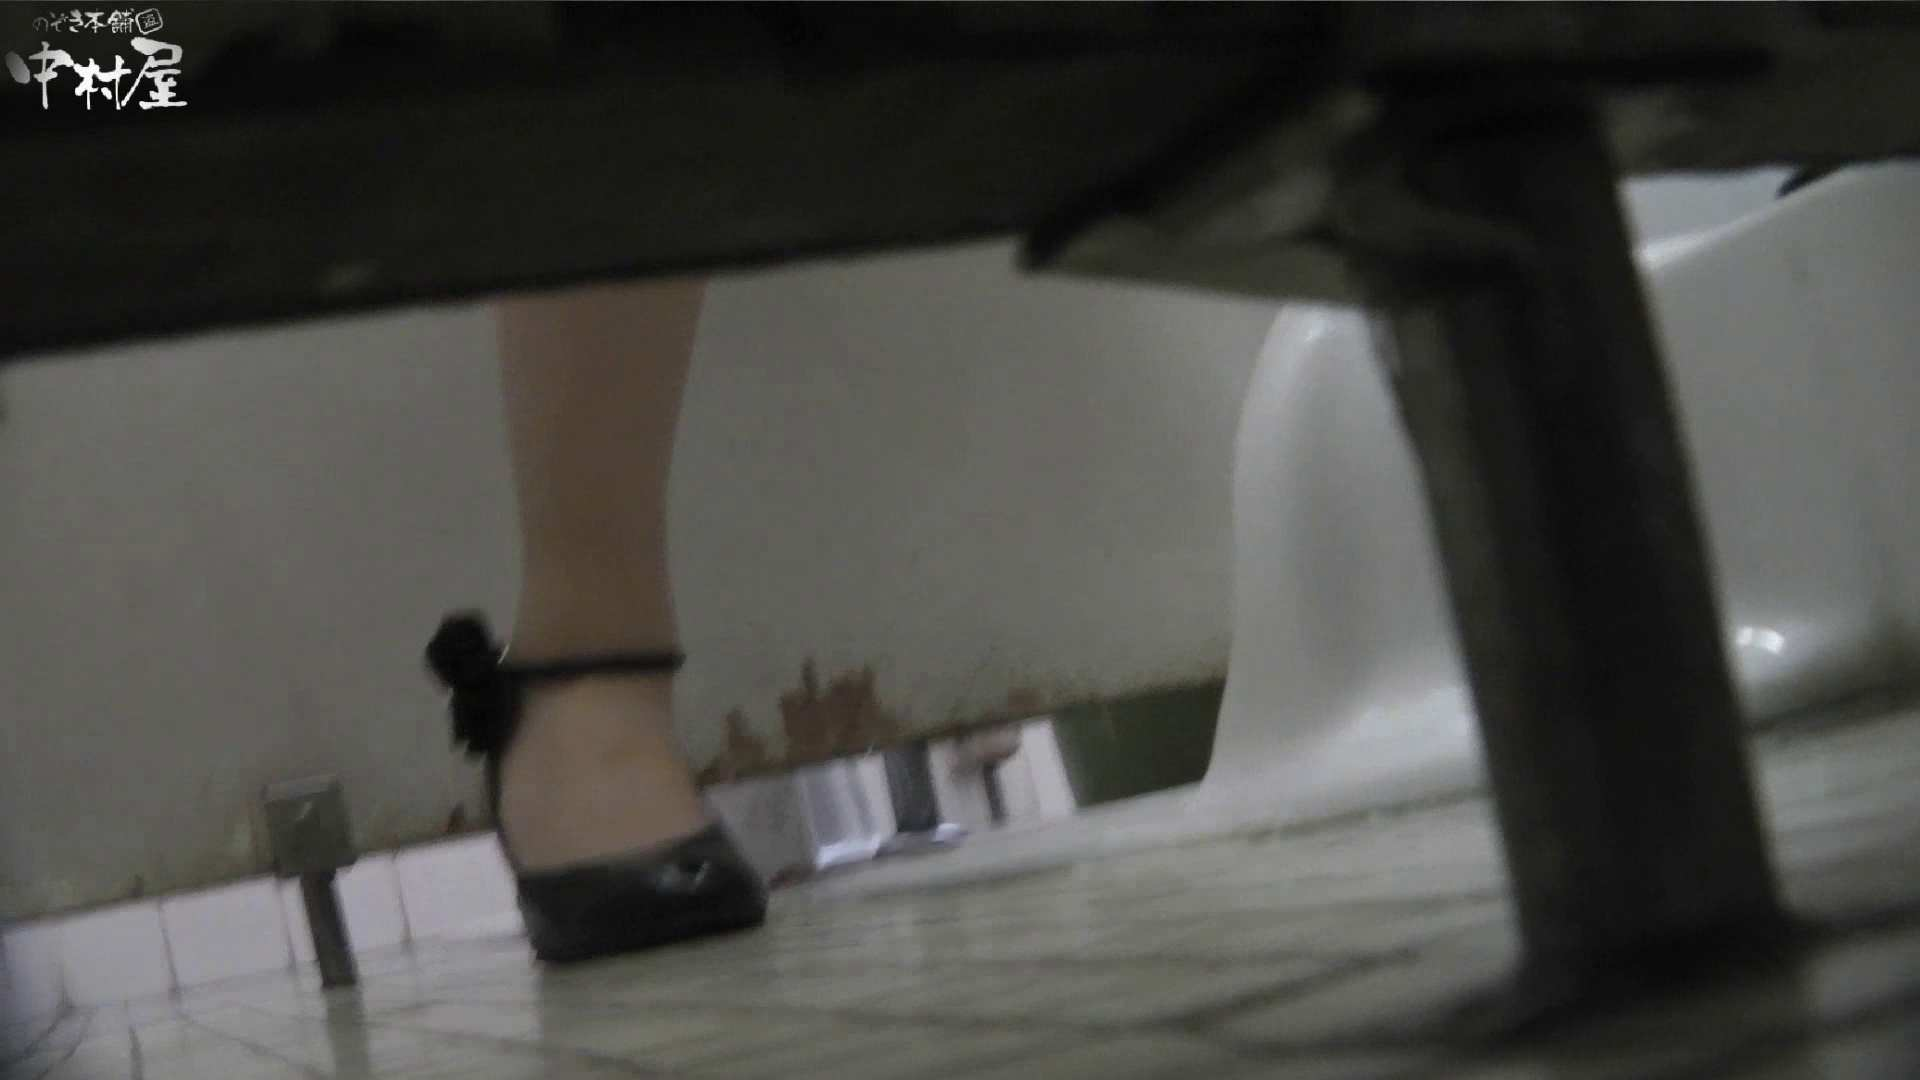 vol.08 命がけ潜伏洗面所! わかめ酒タラタラ 潜入 盗み撮り動画キャプチャ 103画像 2